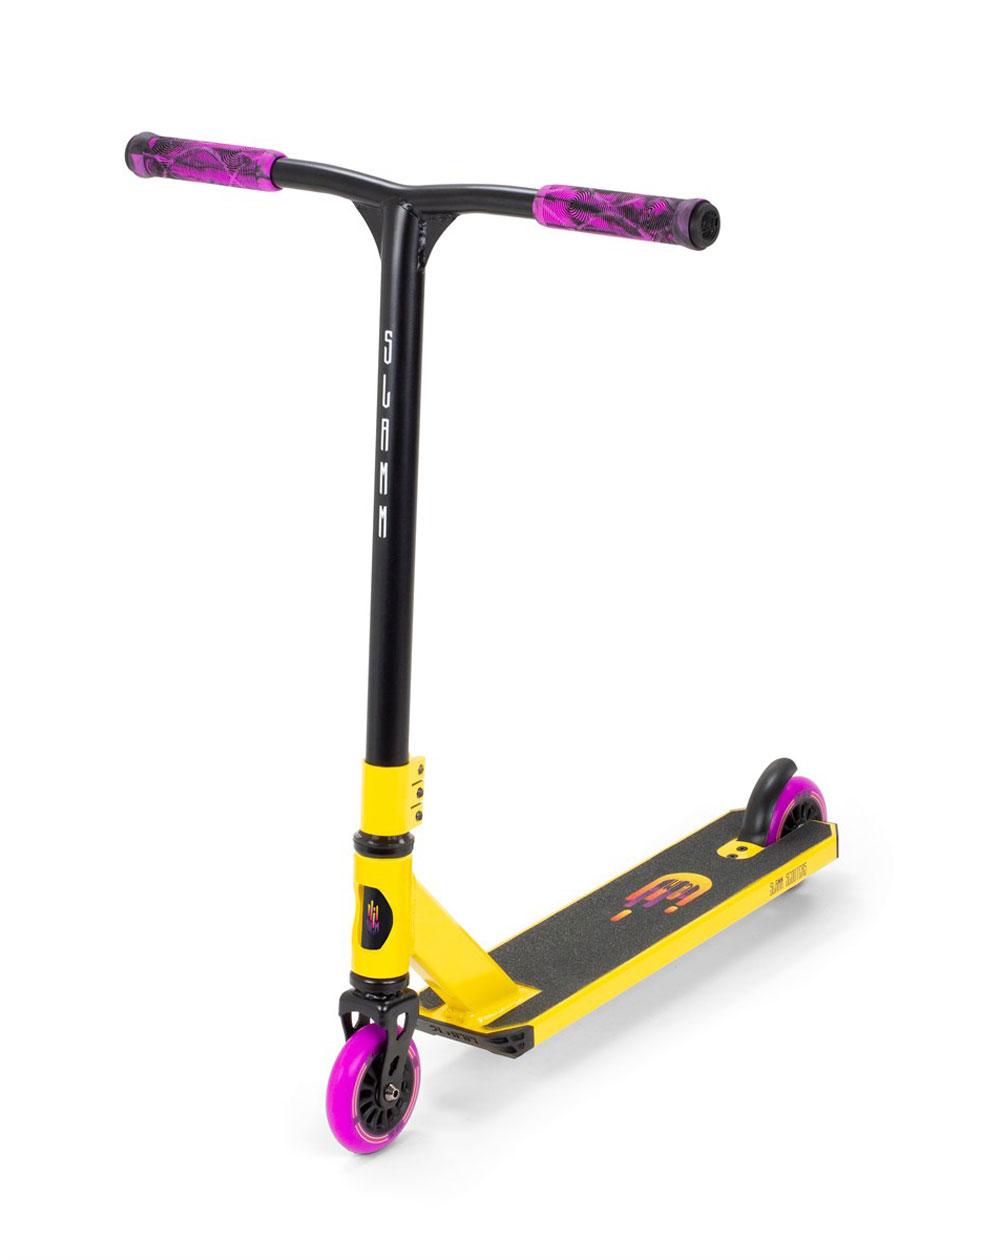 Slamm Scooters Trottinette Freestyle Tantrum V9 Yellow